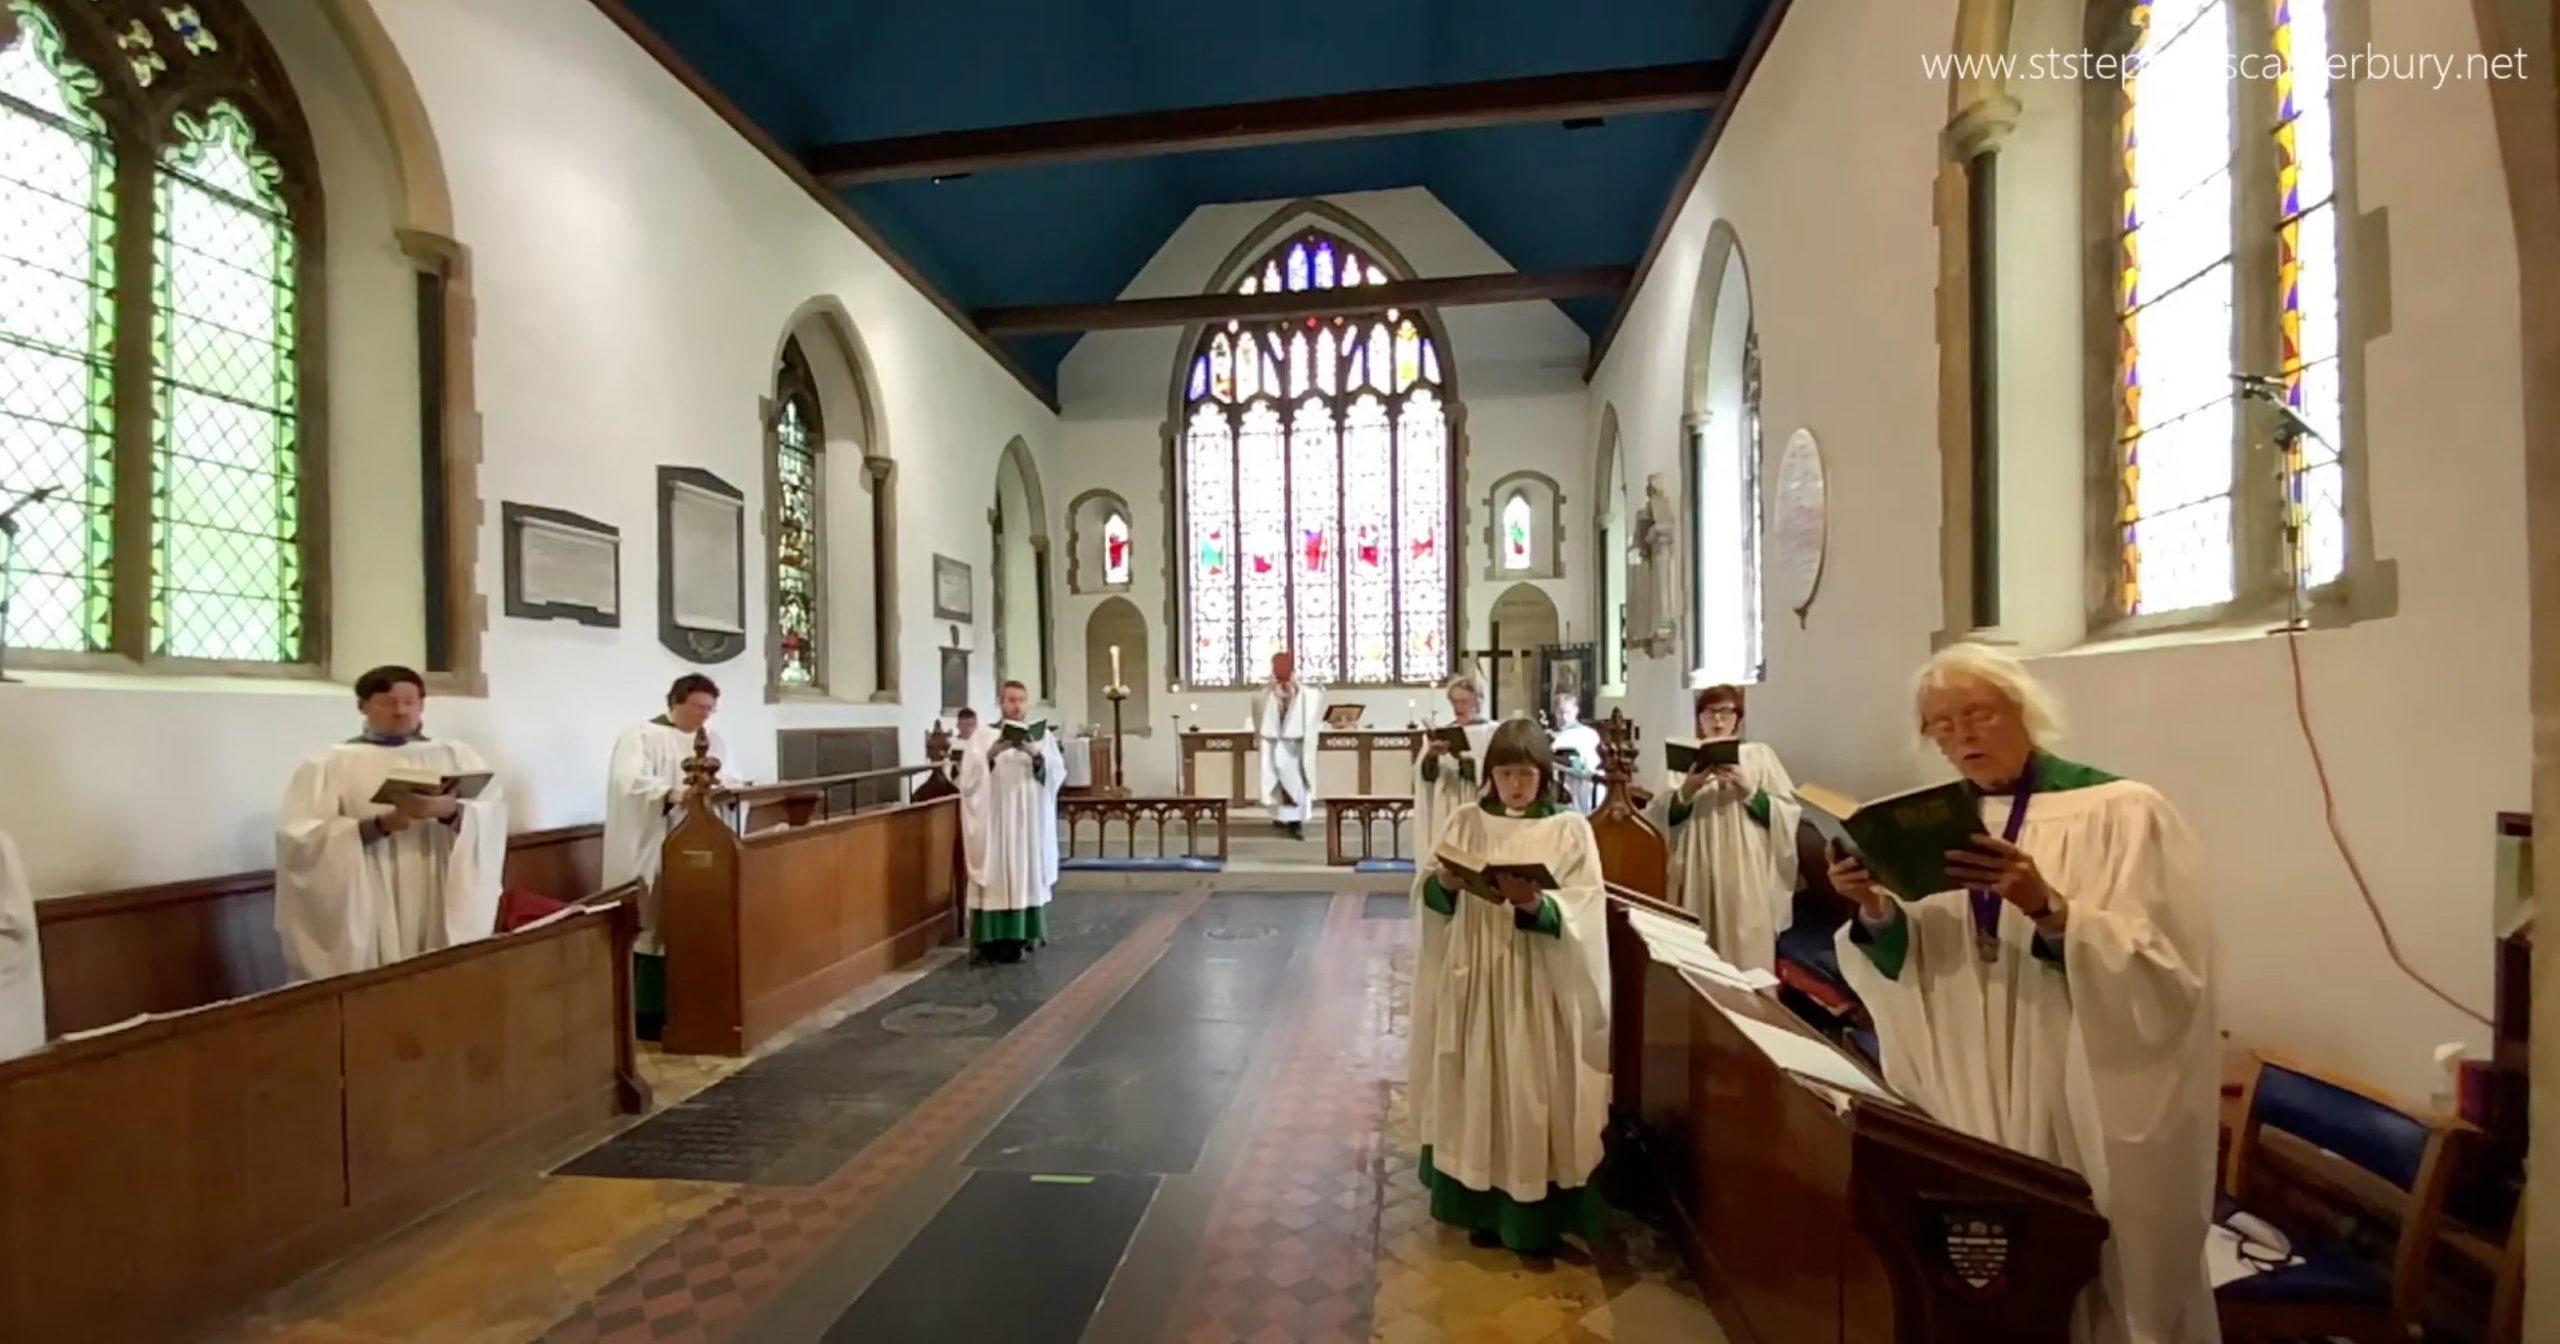 Where have half the choir gone?!